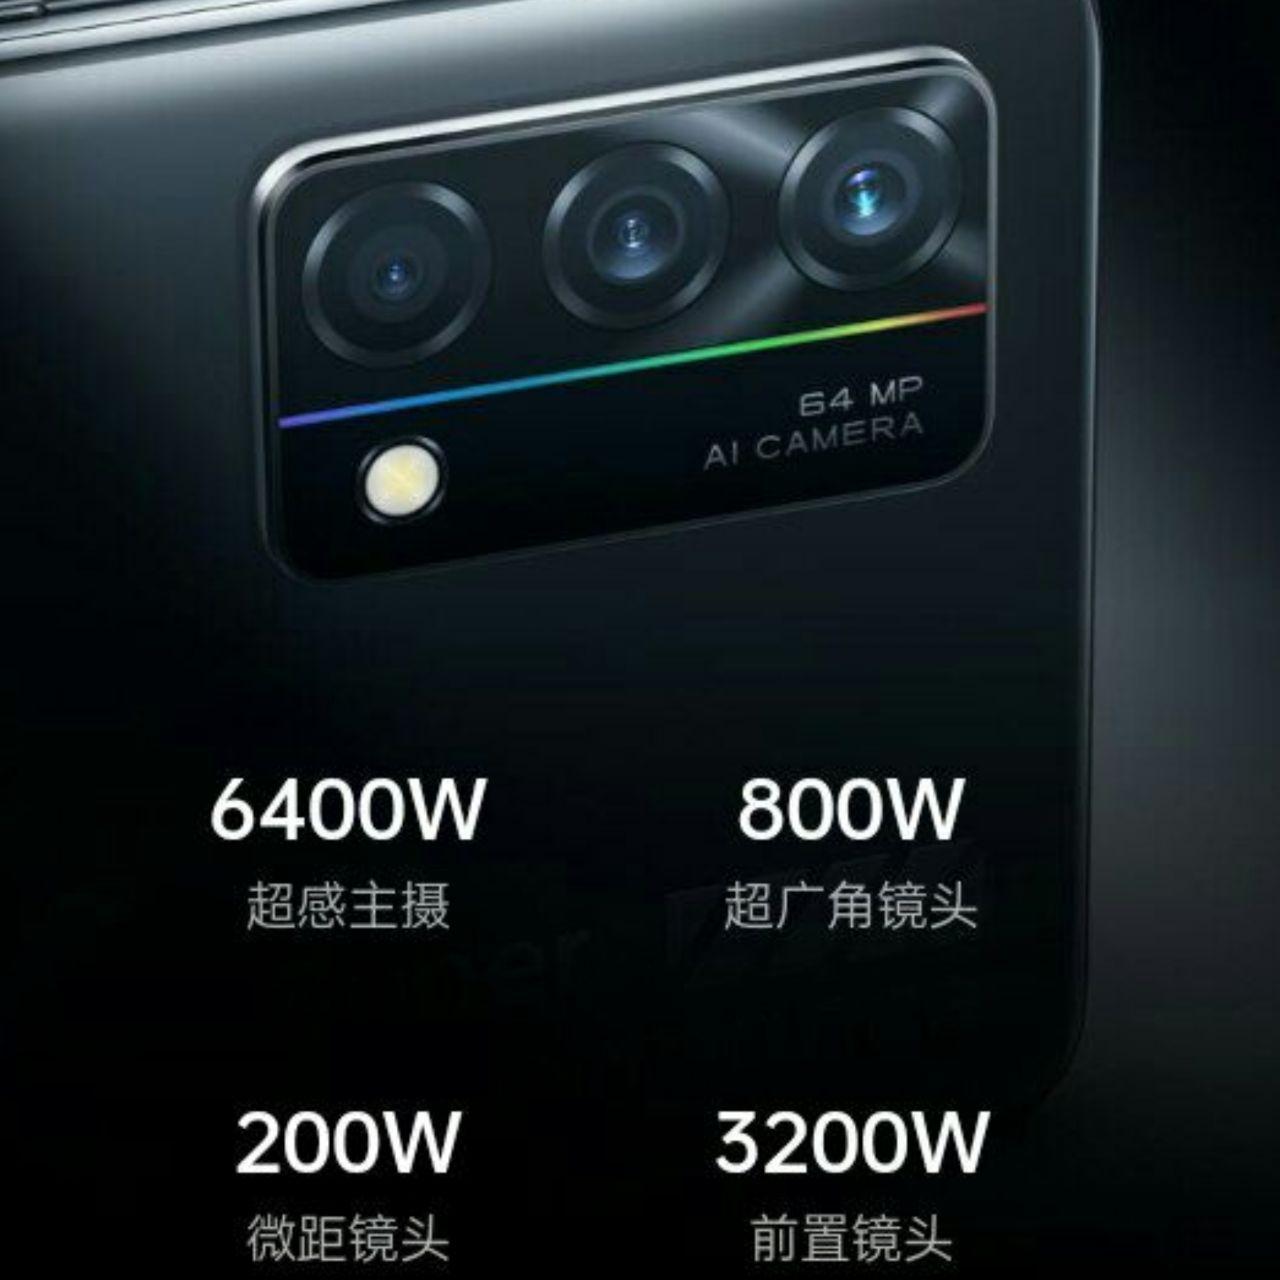 دوربین Oppo K9